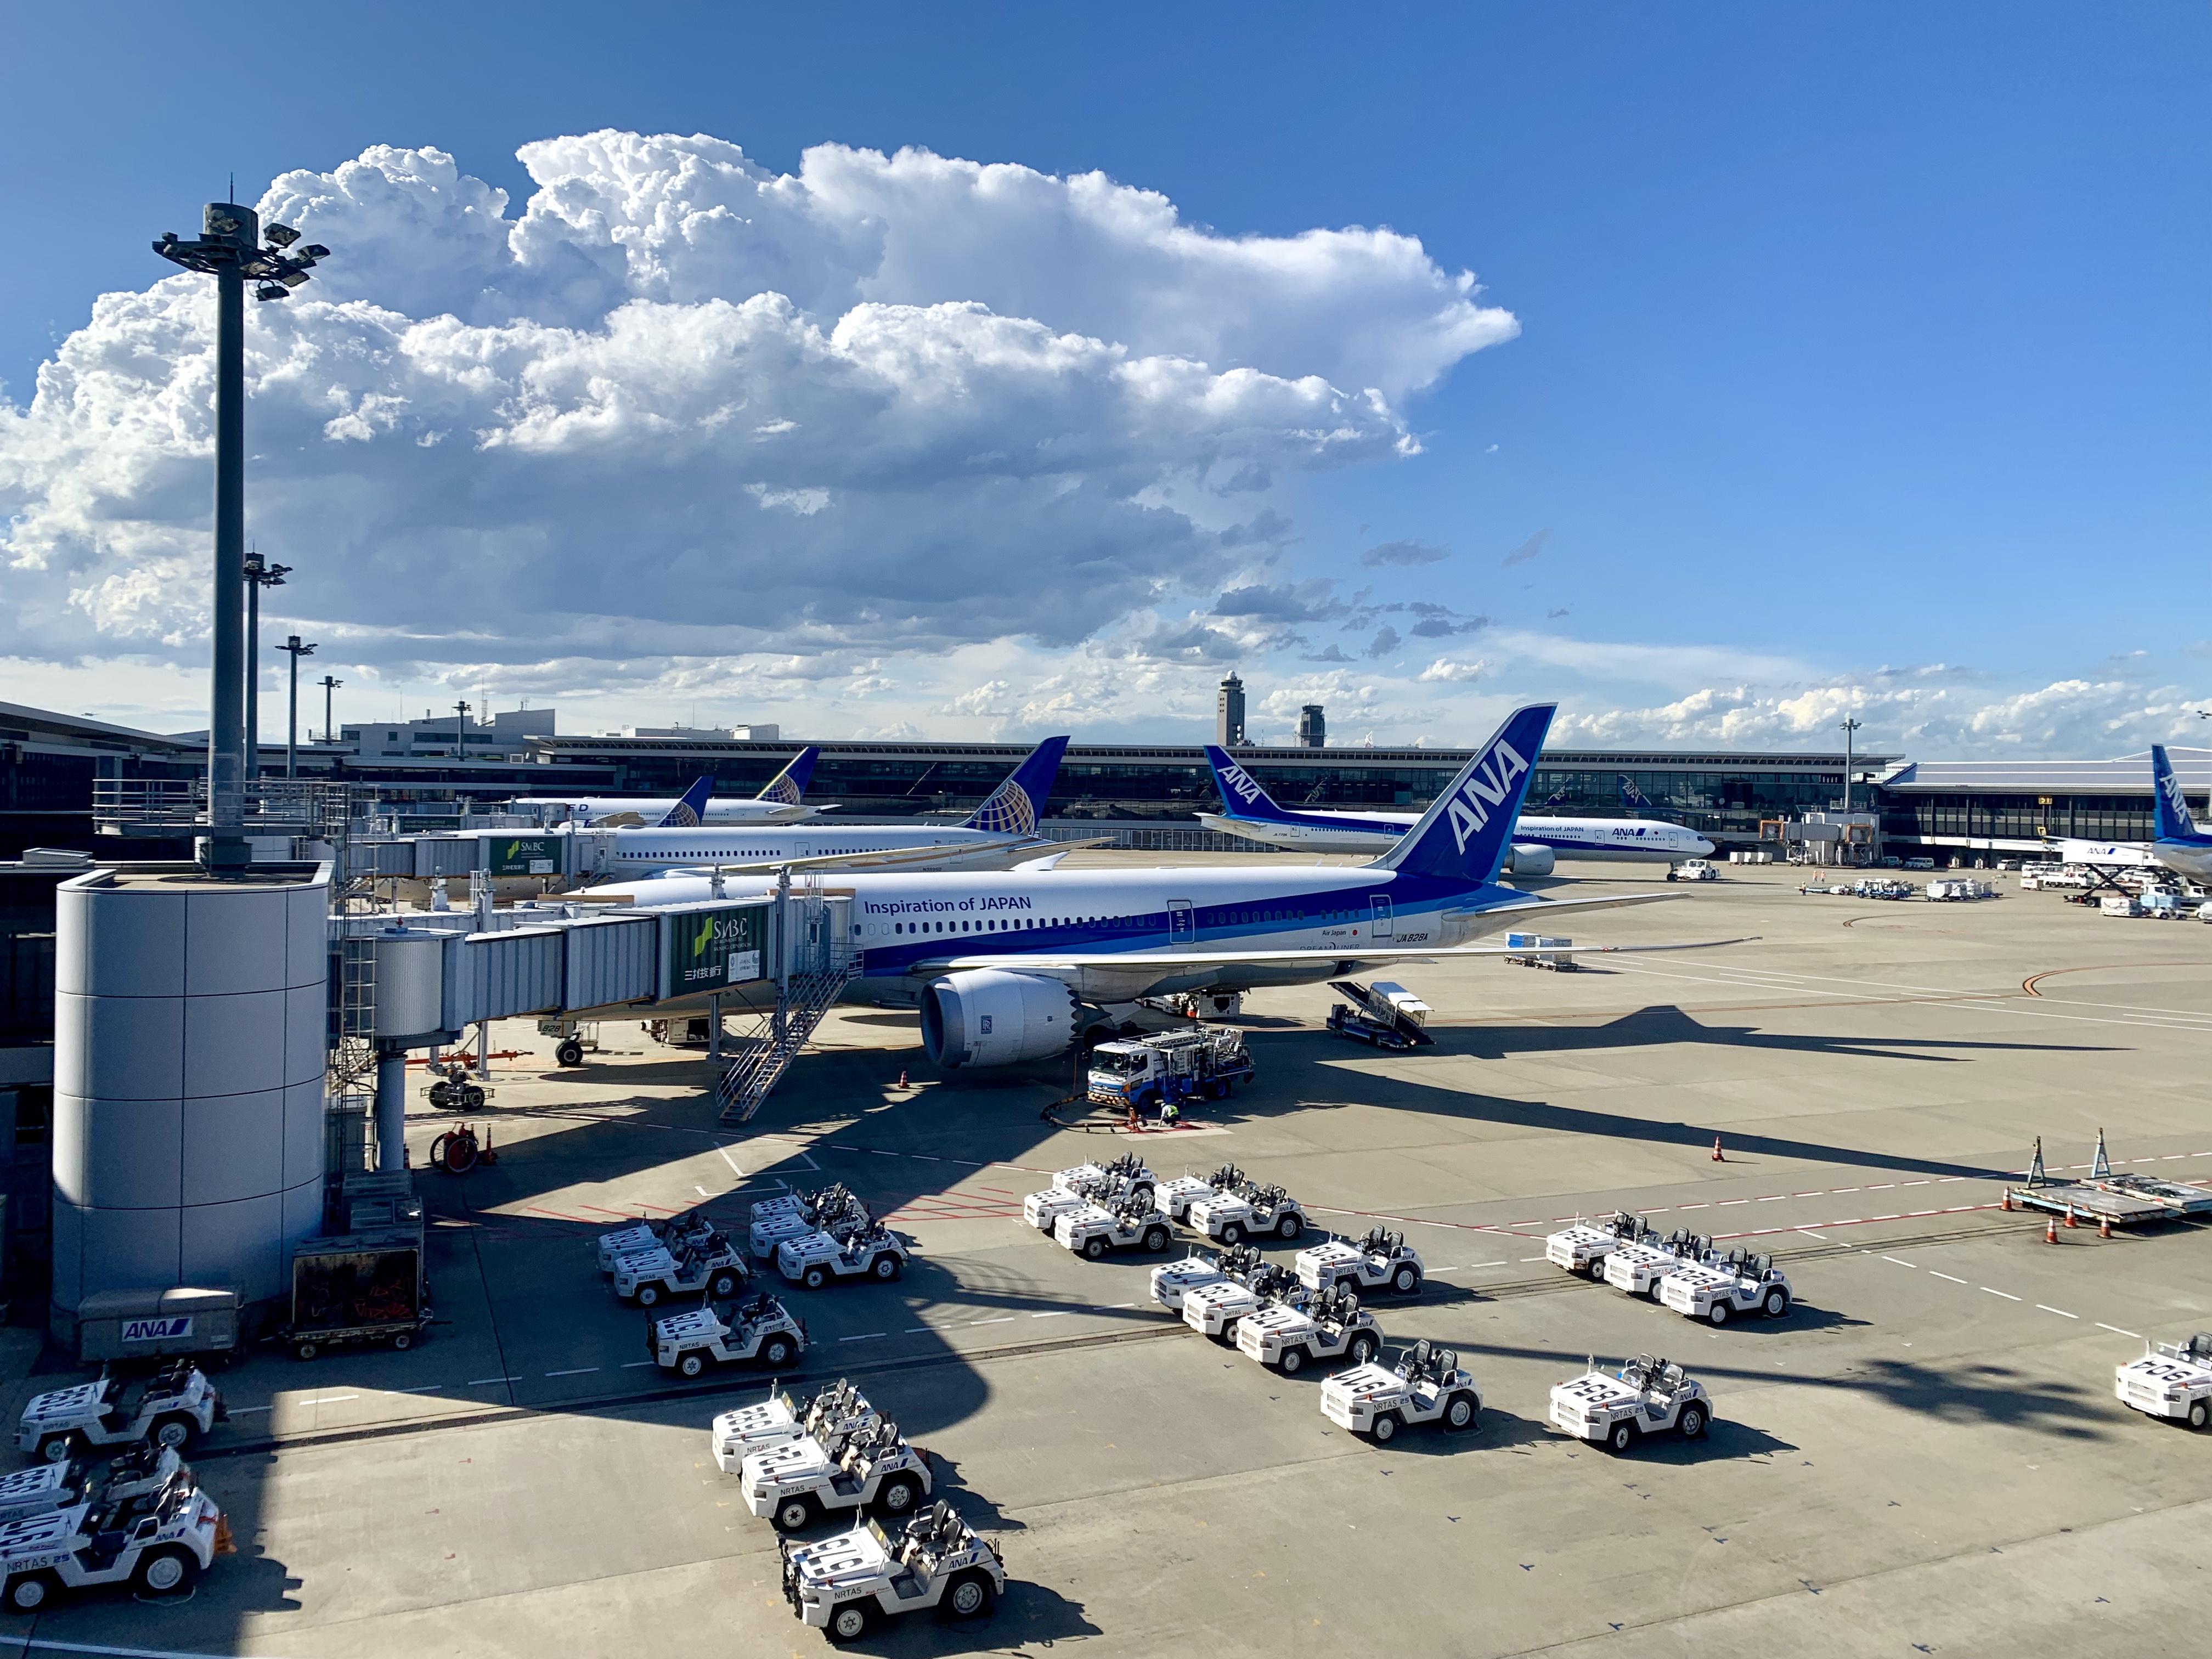 NH807 成田-バンコク B787-9 (789)ビジネスクラス搭乗記